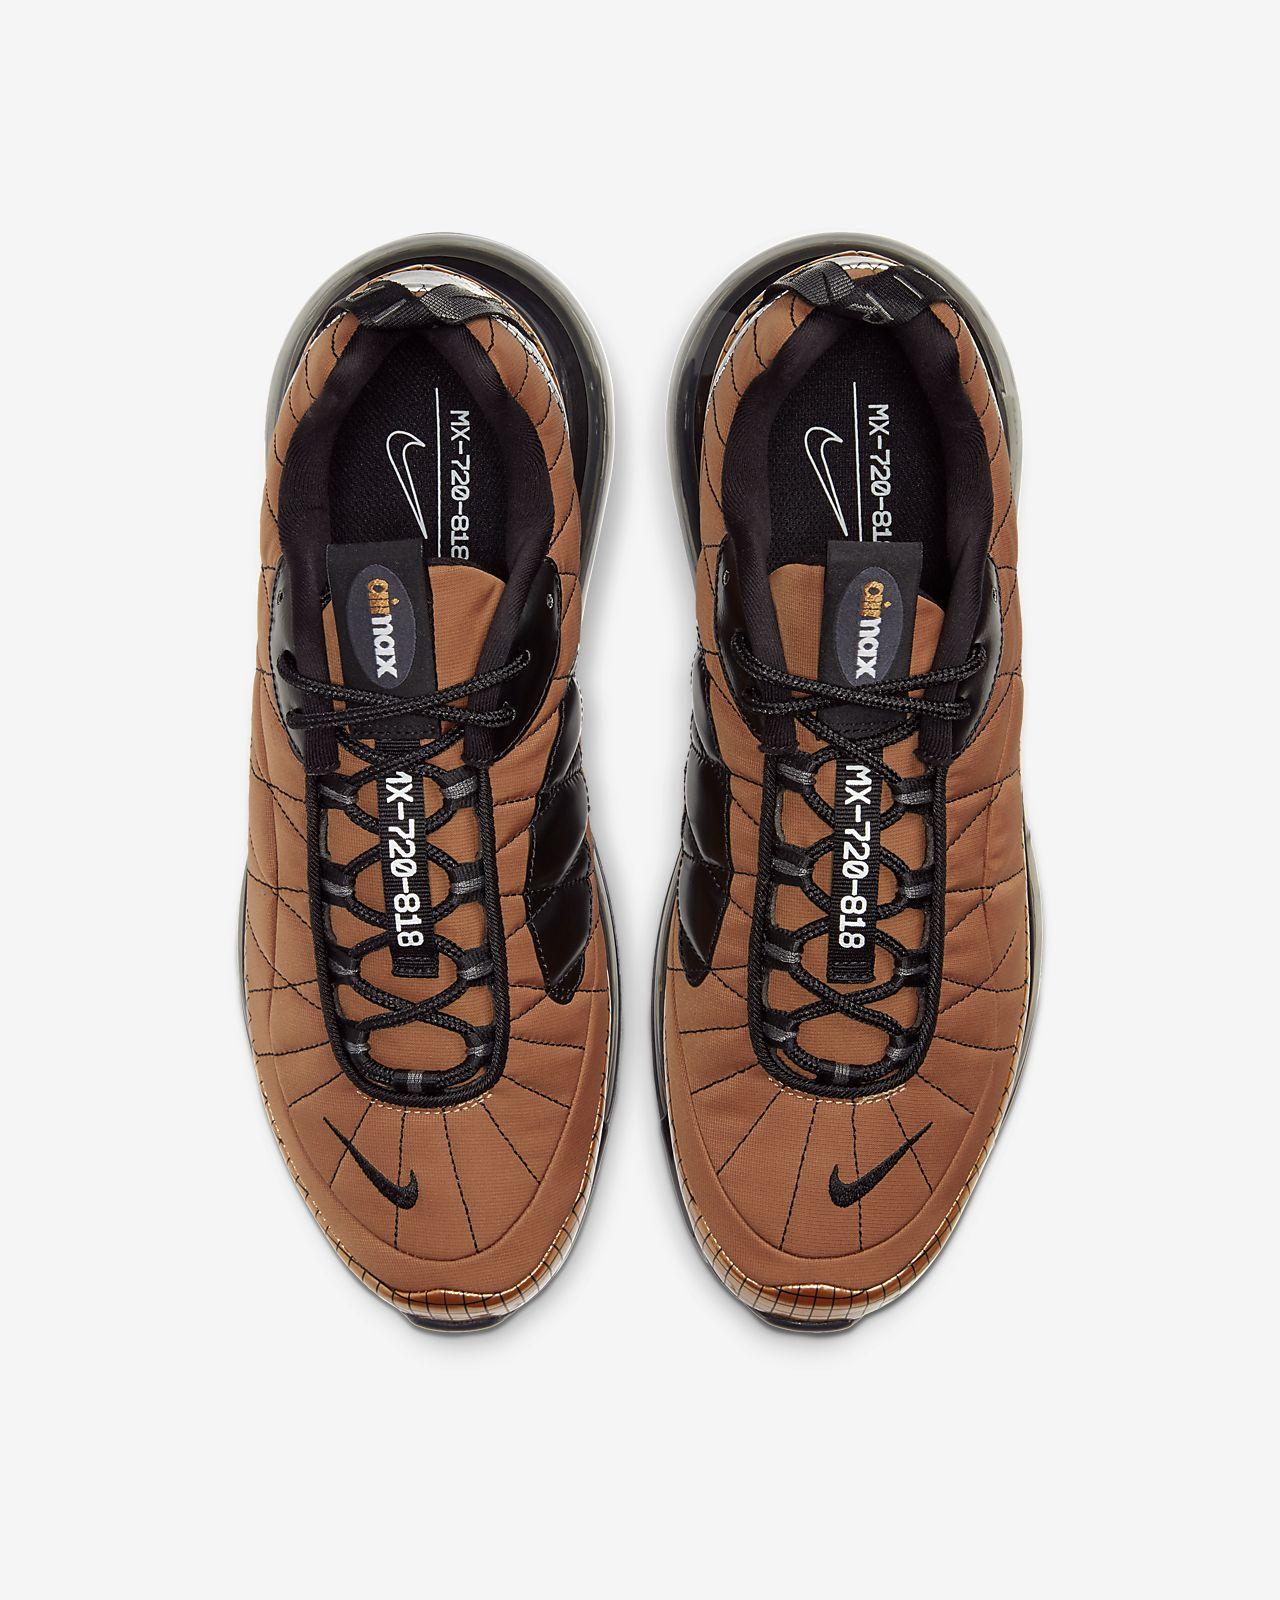 Scarpa Nike MX 720 818 Uomo